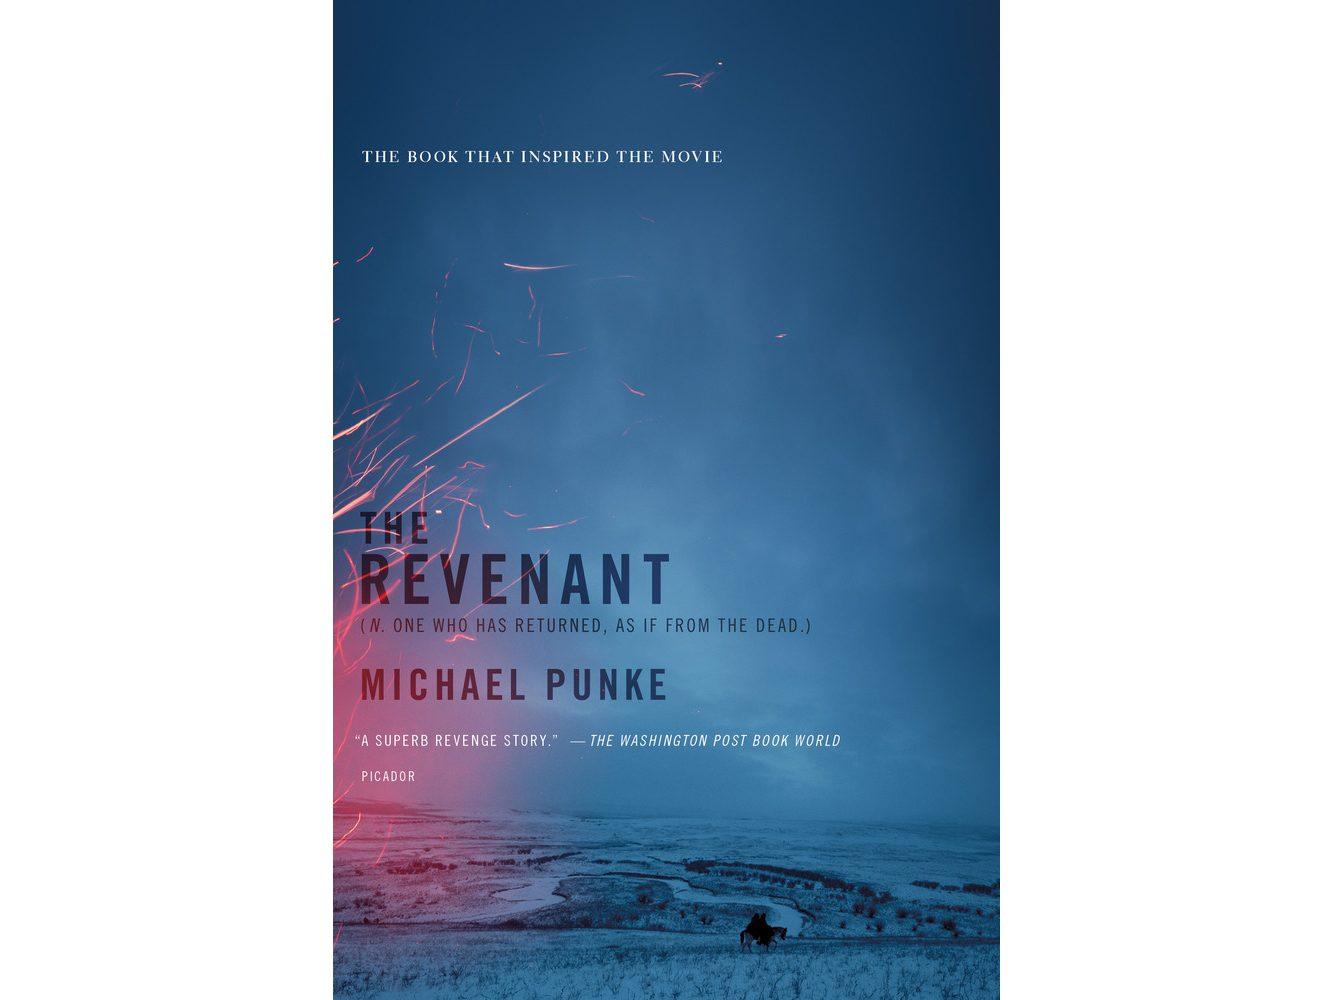 1. The Revenant by Michael Punke